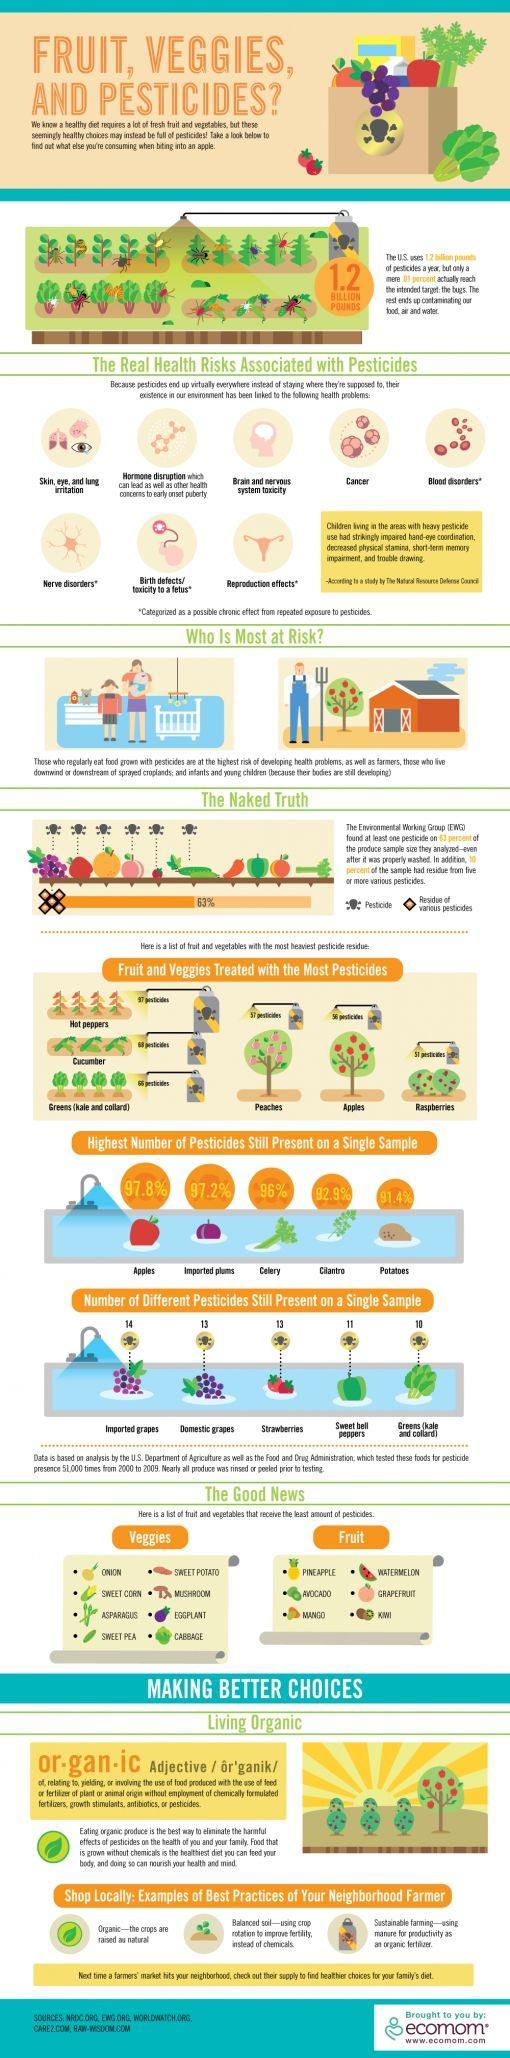 Infographic-Pesticides2